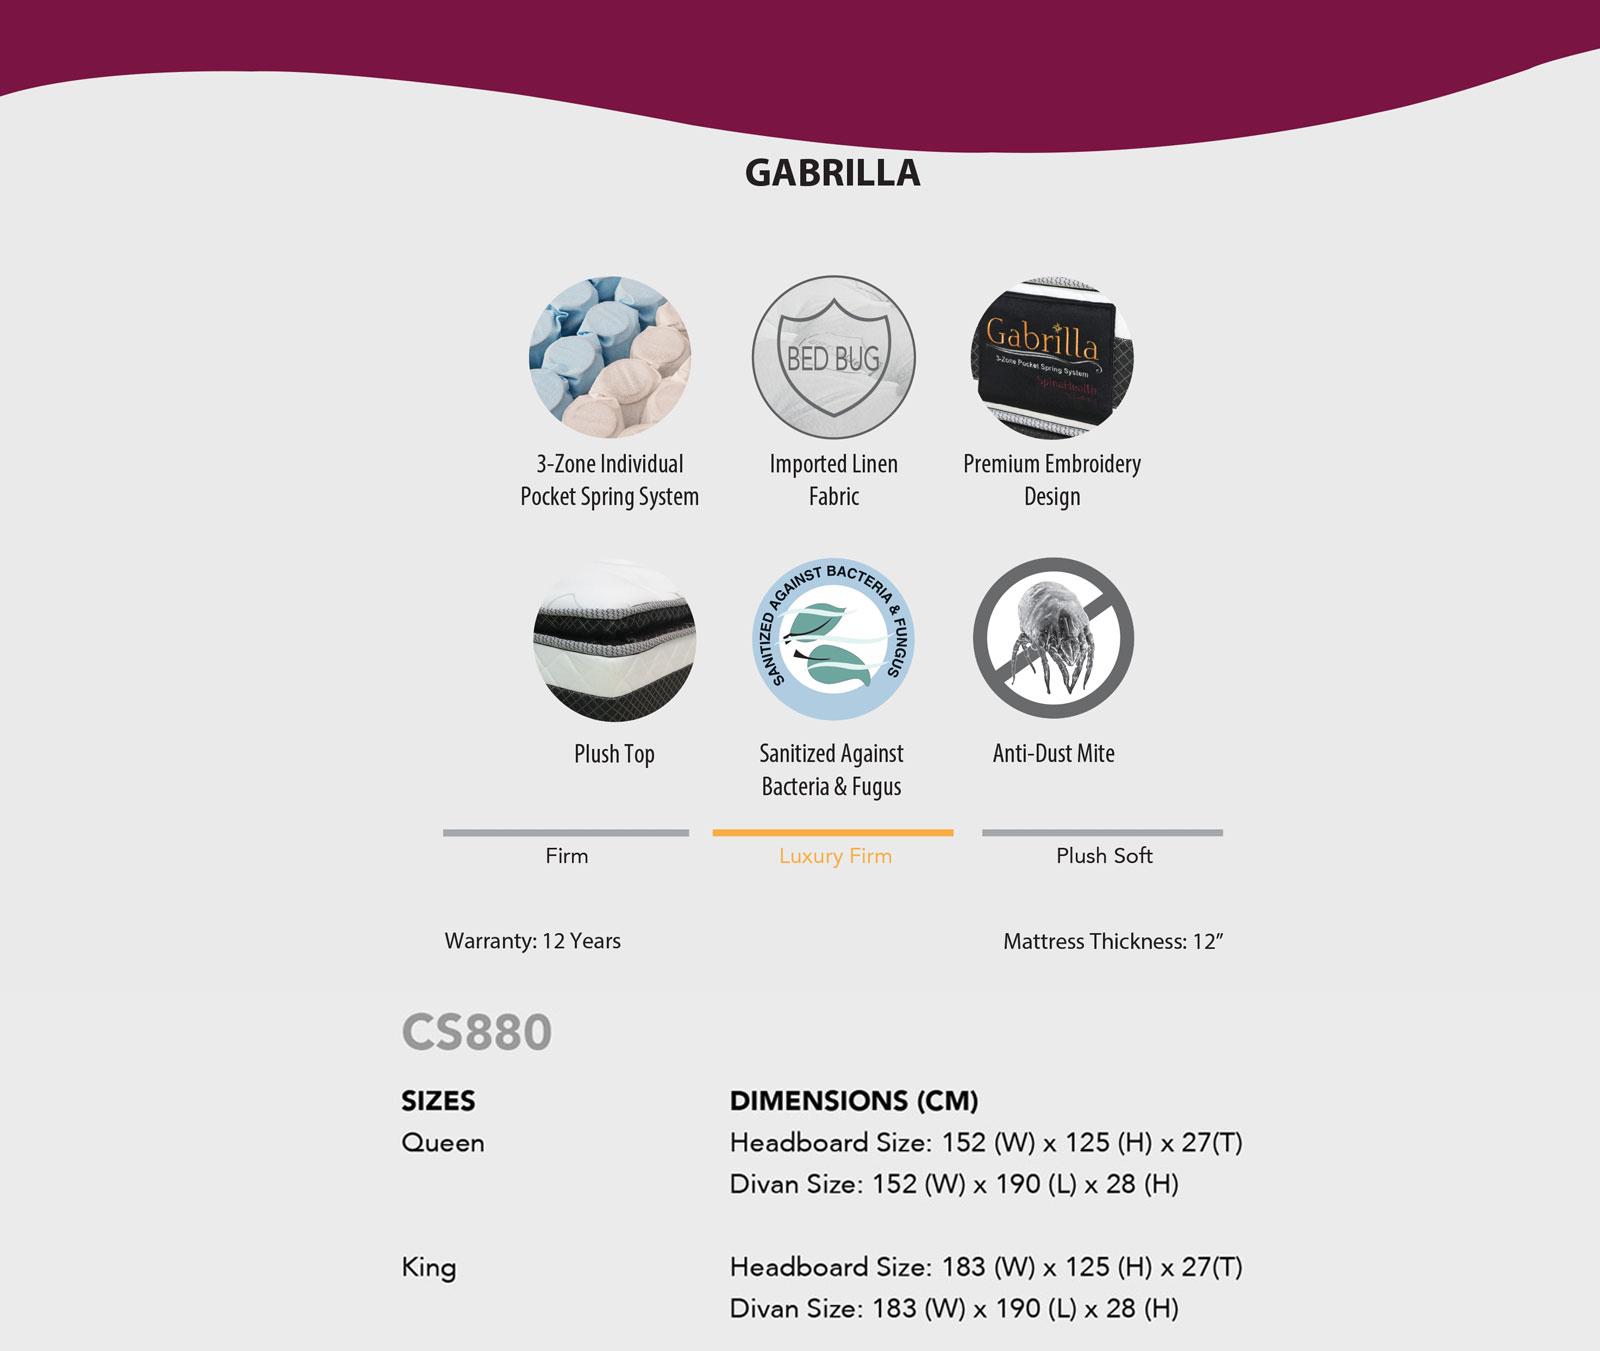 gn-gabrilla-detailss.jpg